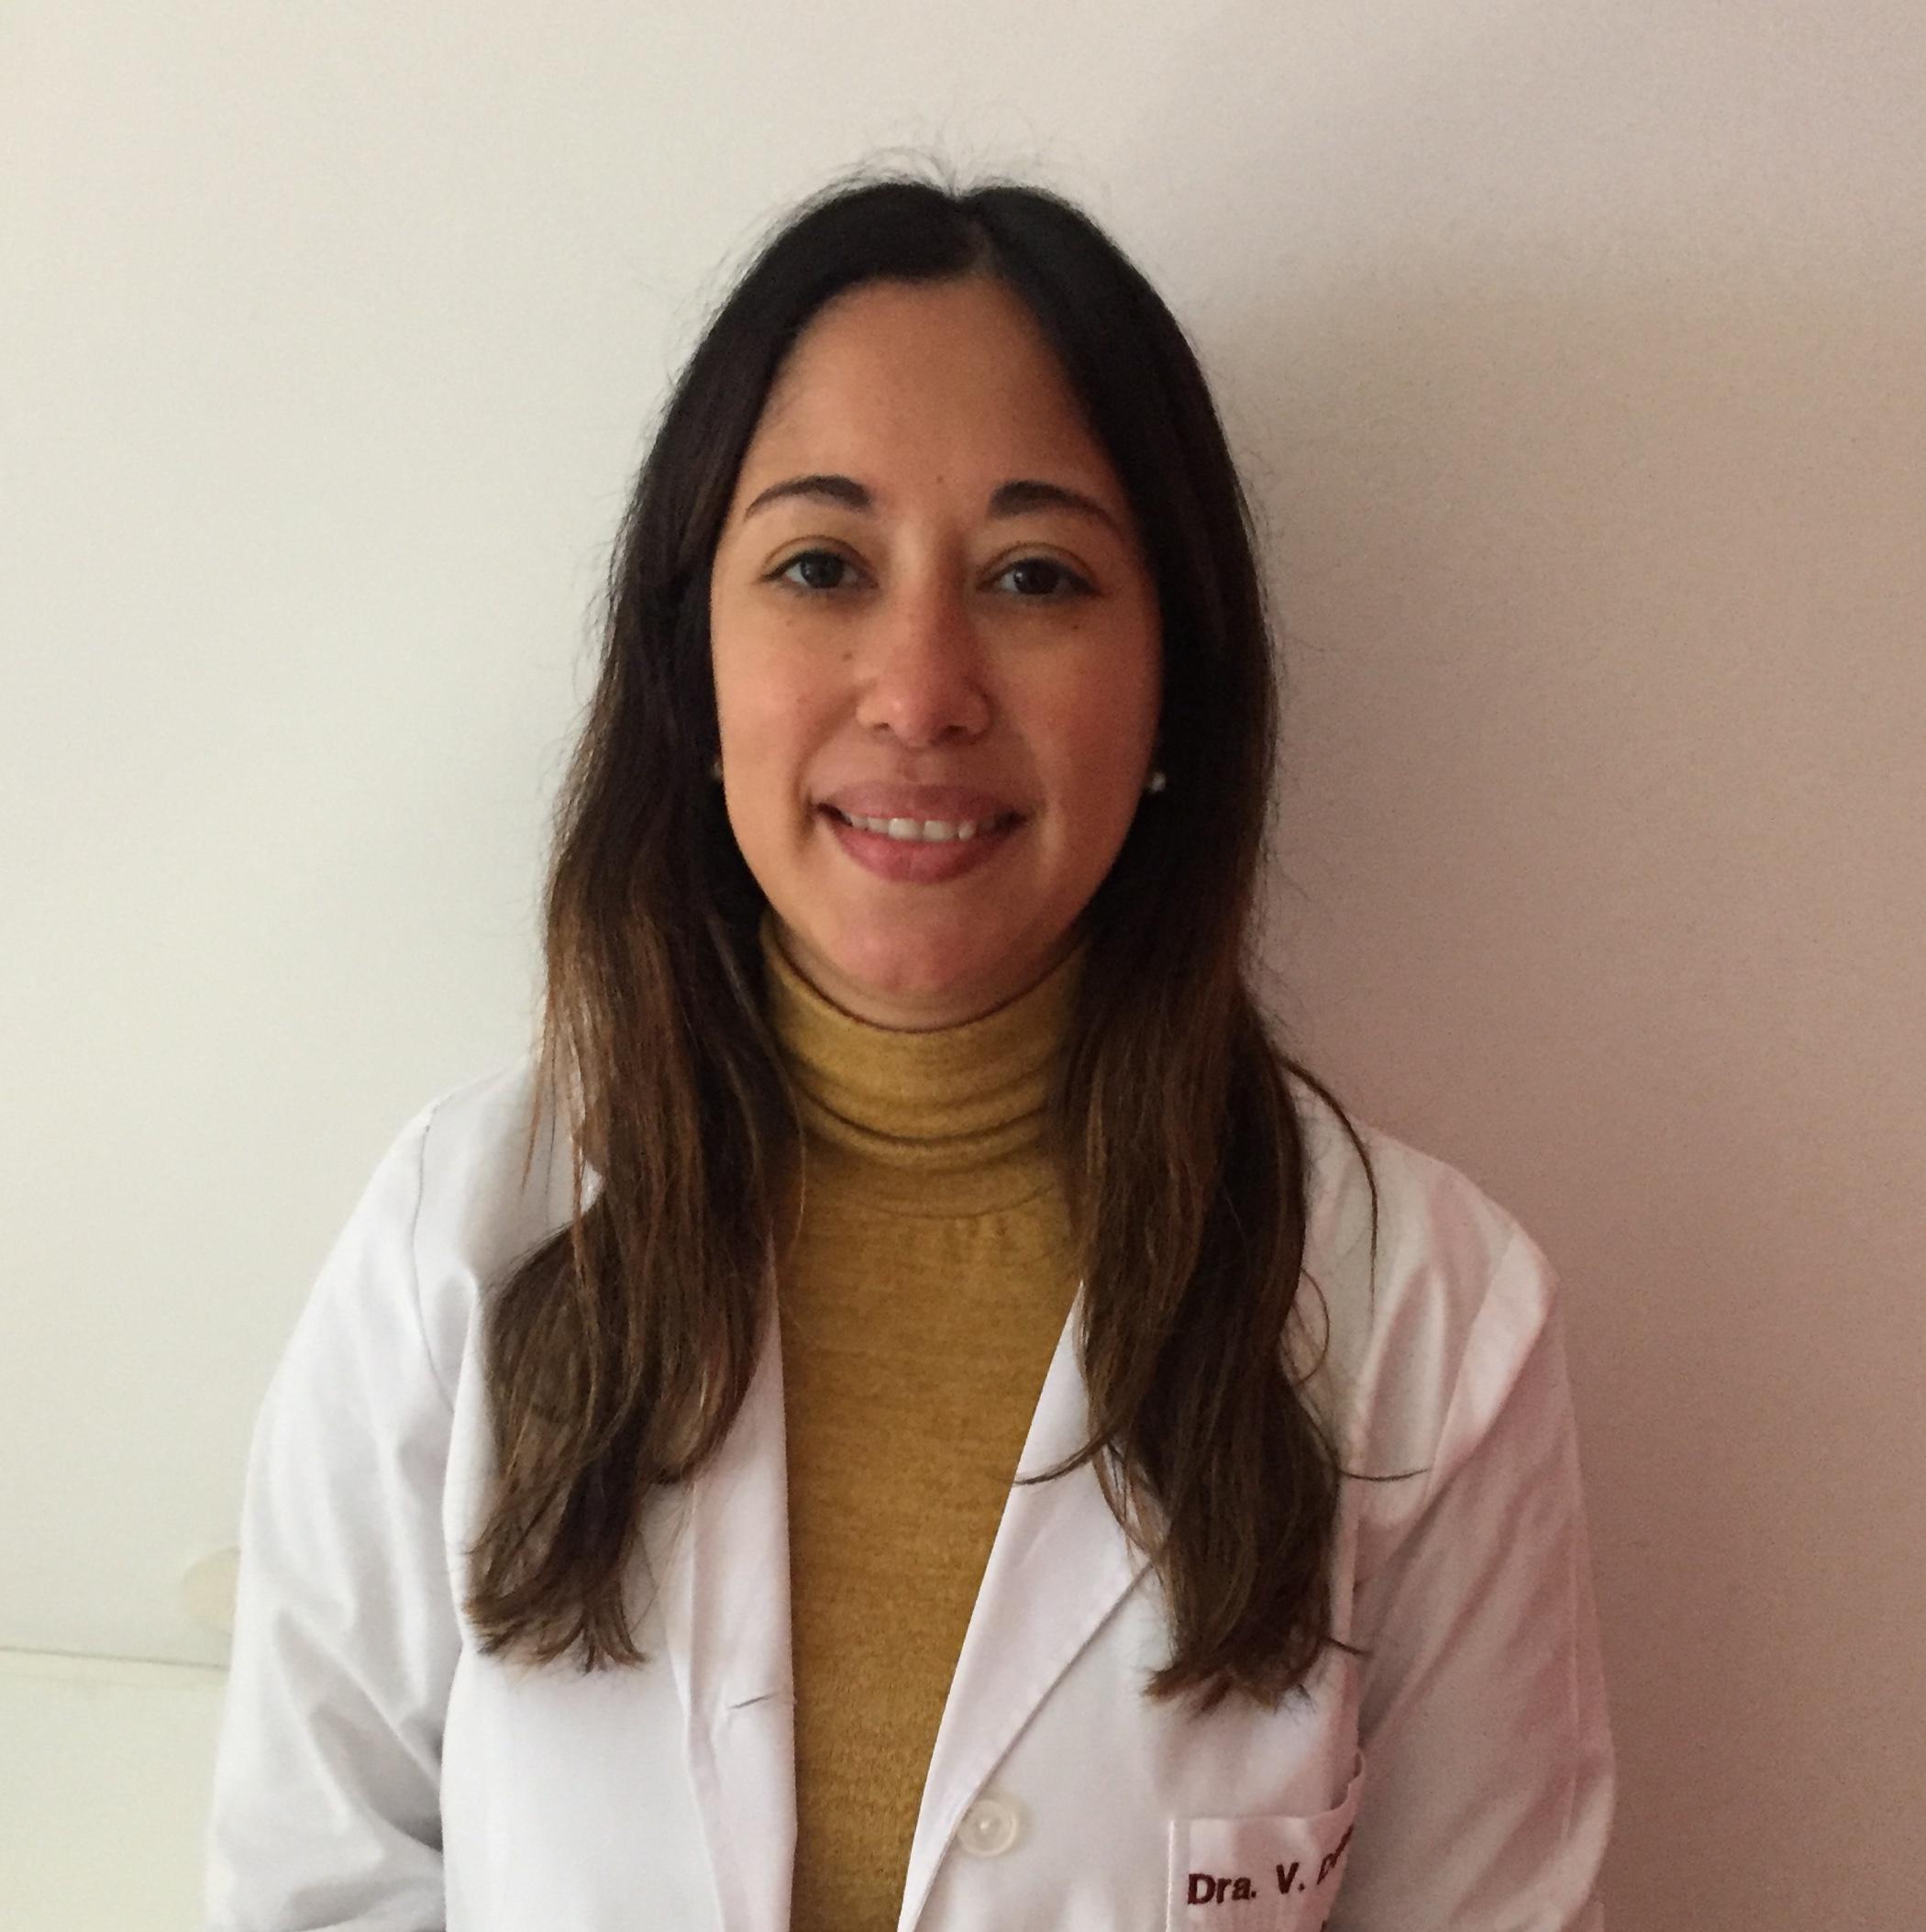 Dra. Deandreis Maria Victoria